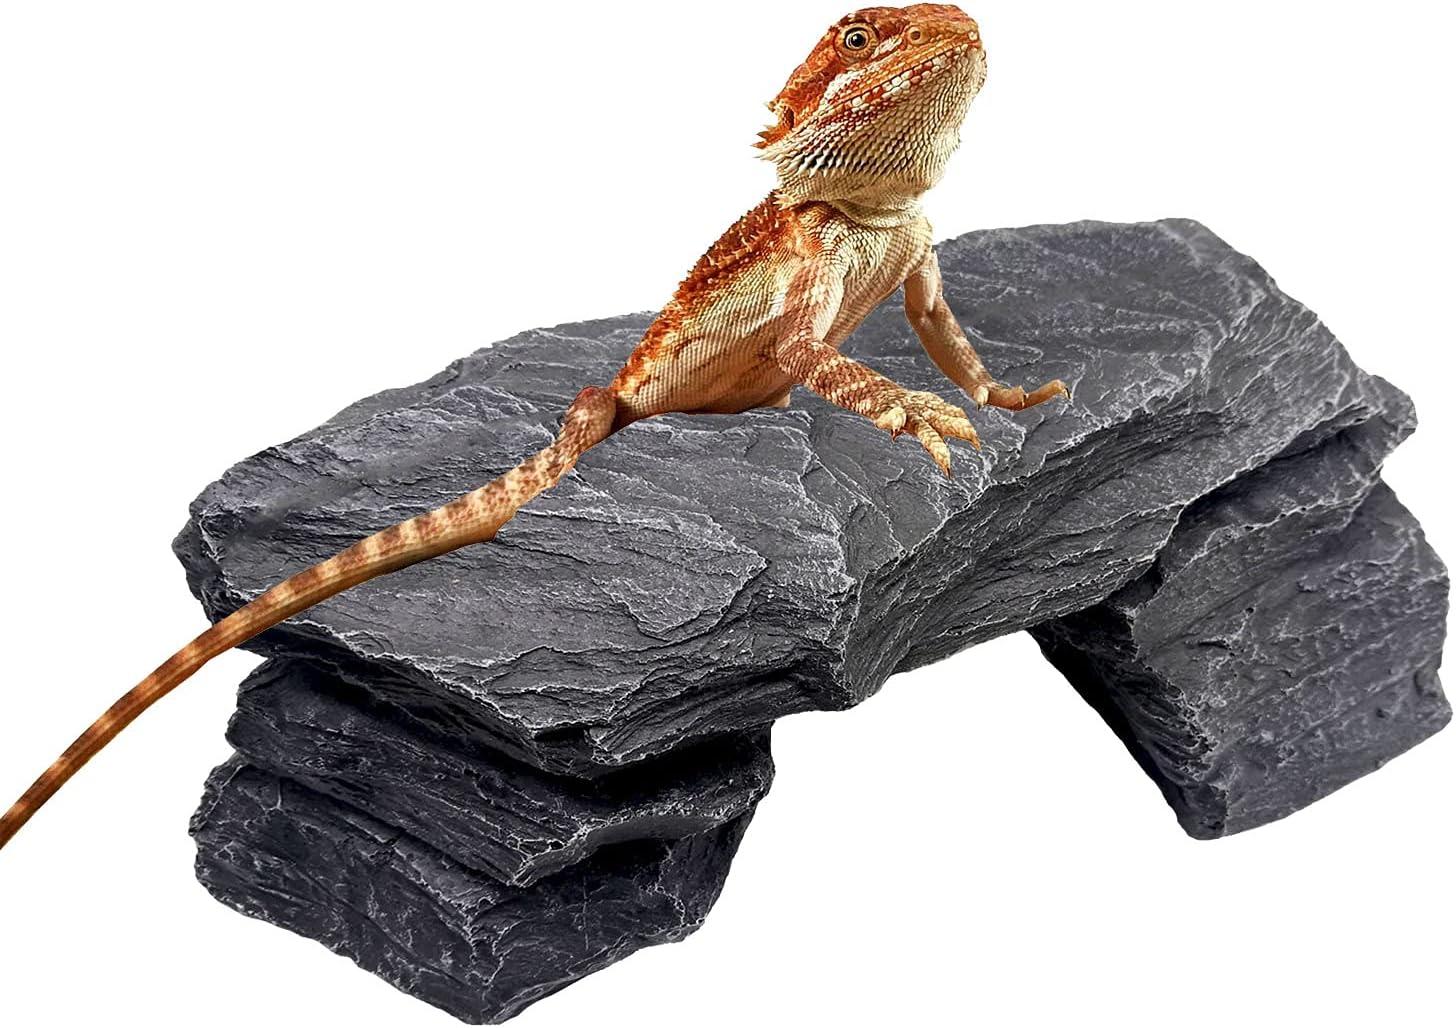 EKUEY Aquarium Decorations New arrival Rock Reptile Platform Habitat Dallas Mall f Slate